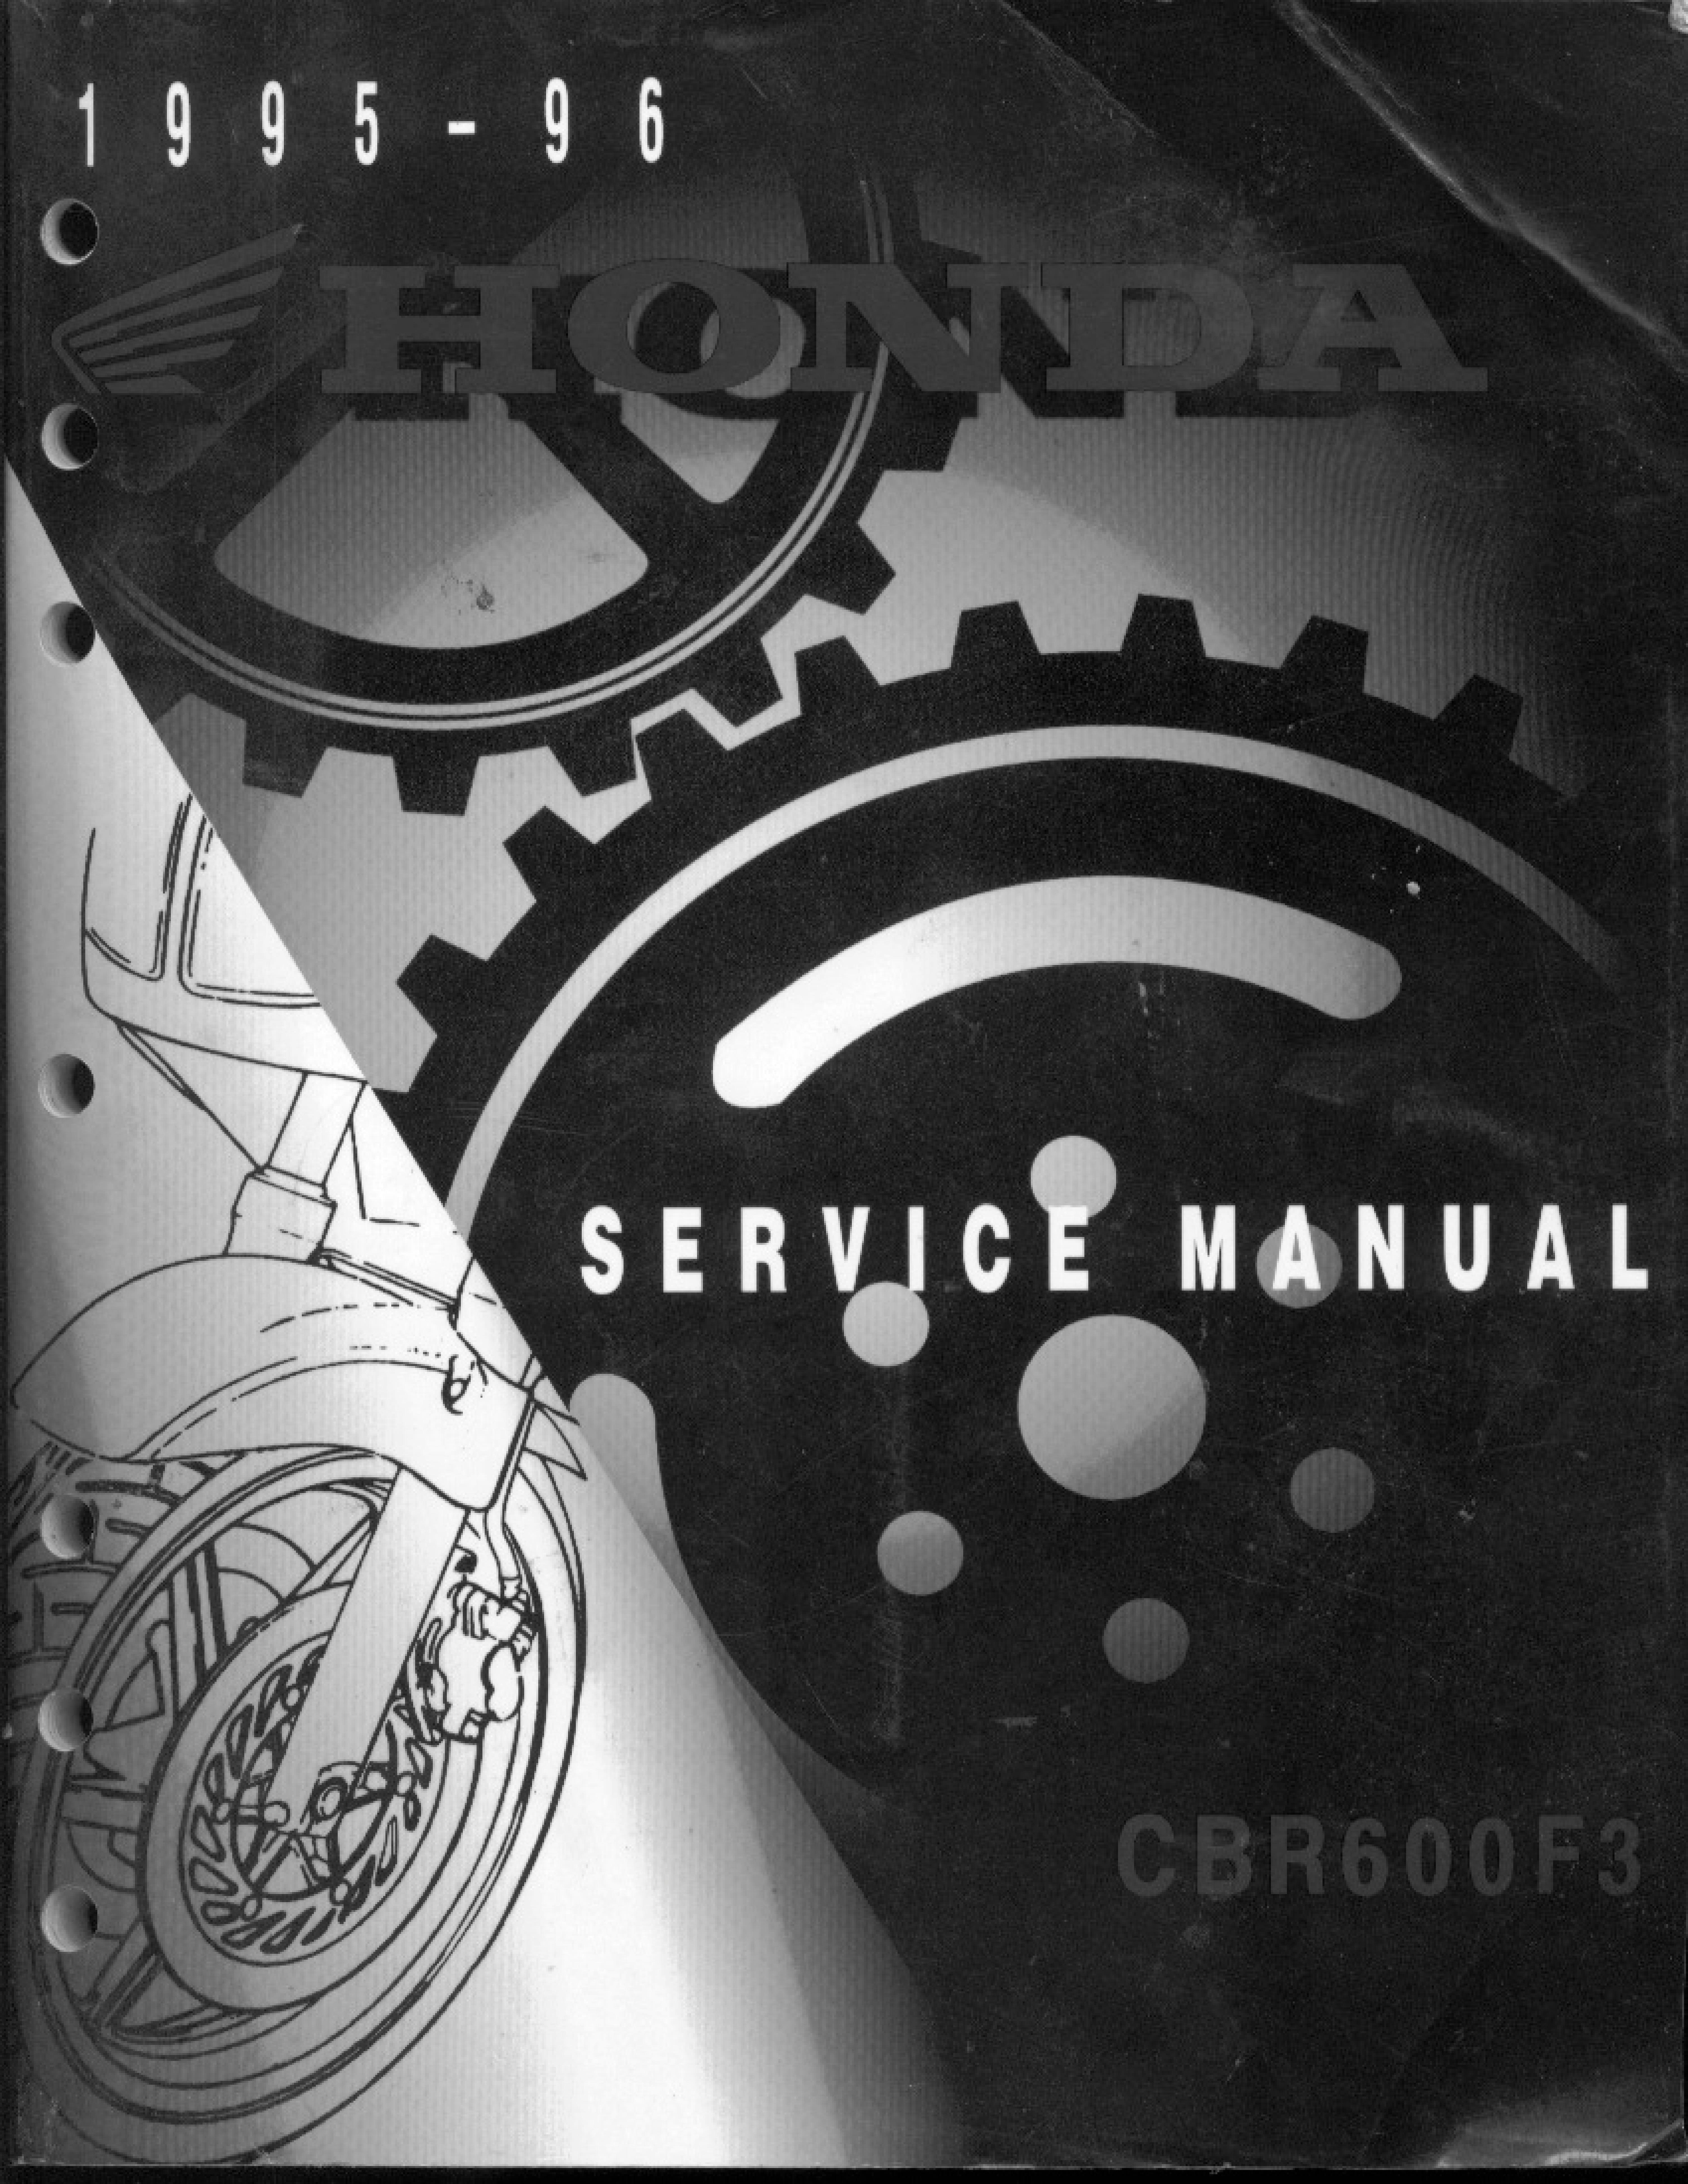 Workshop Manual for Honda CBR600F3 (1995-1996)